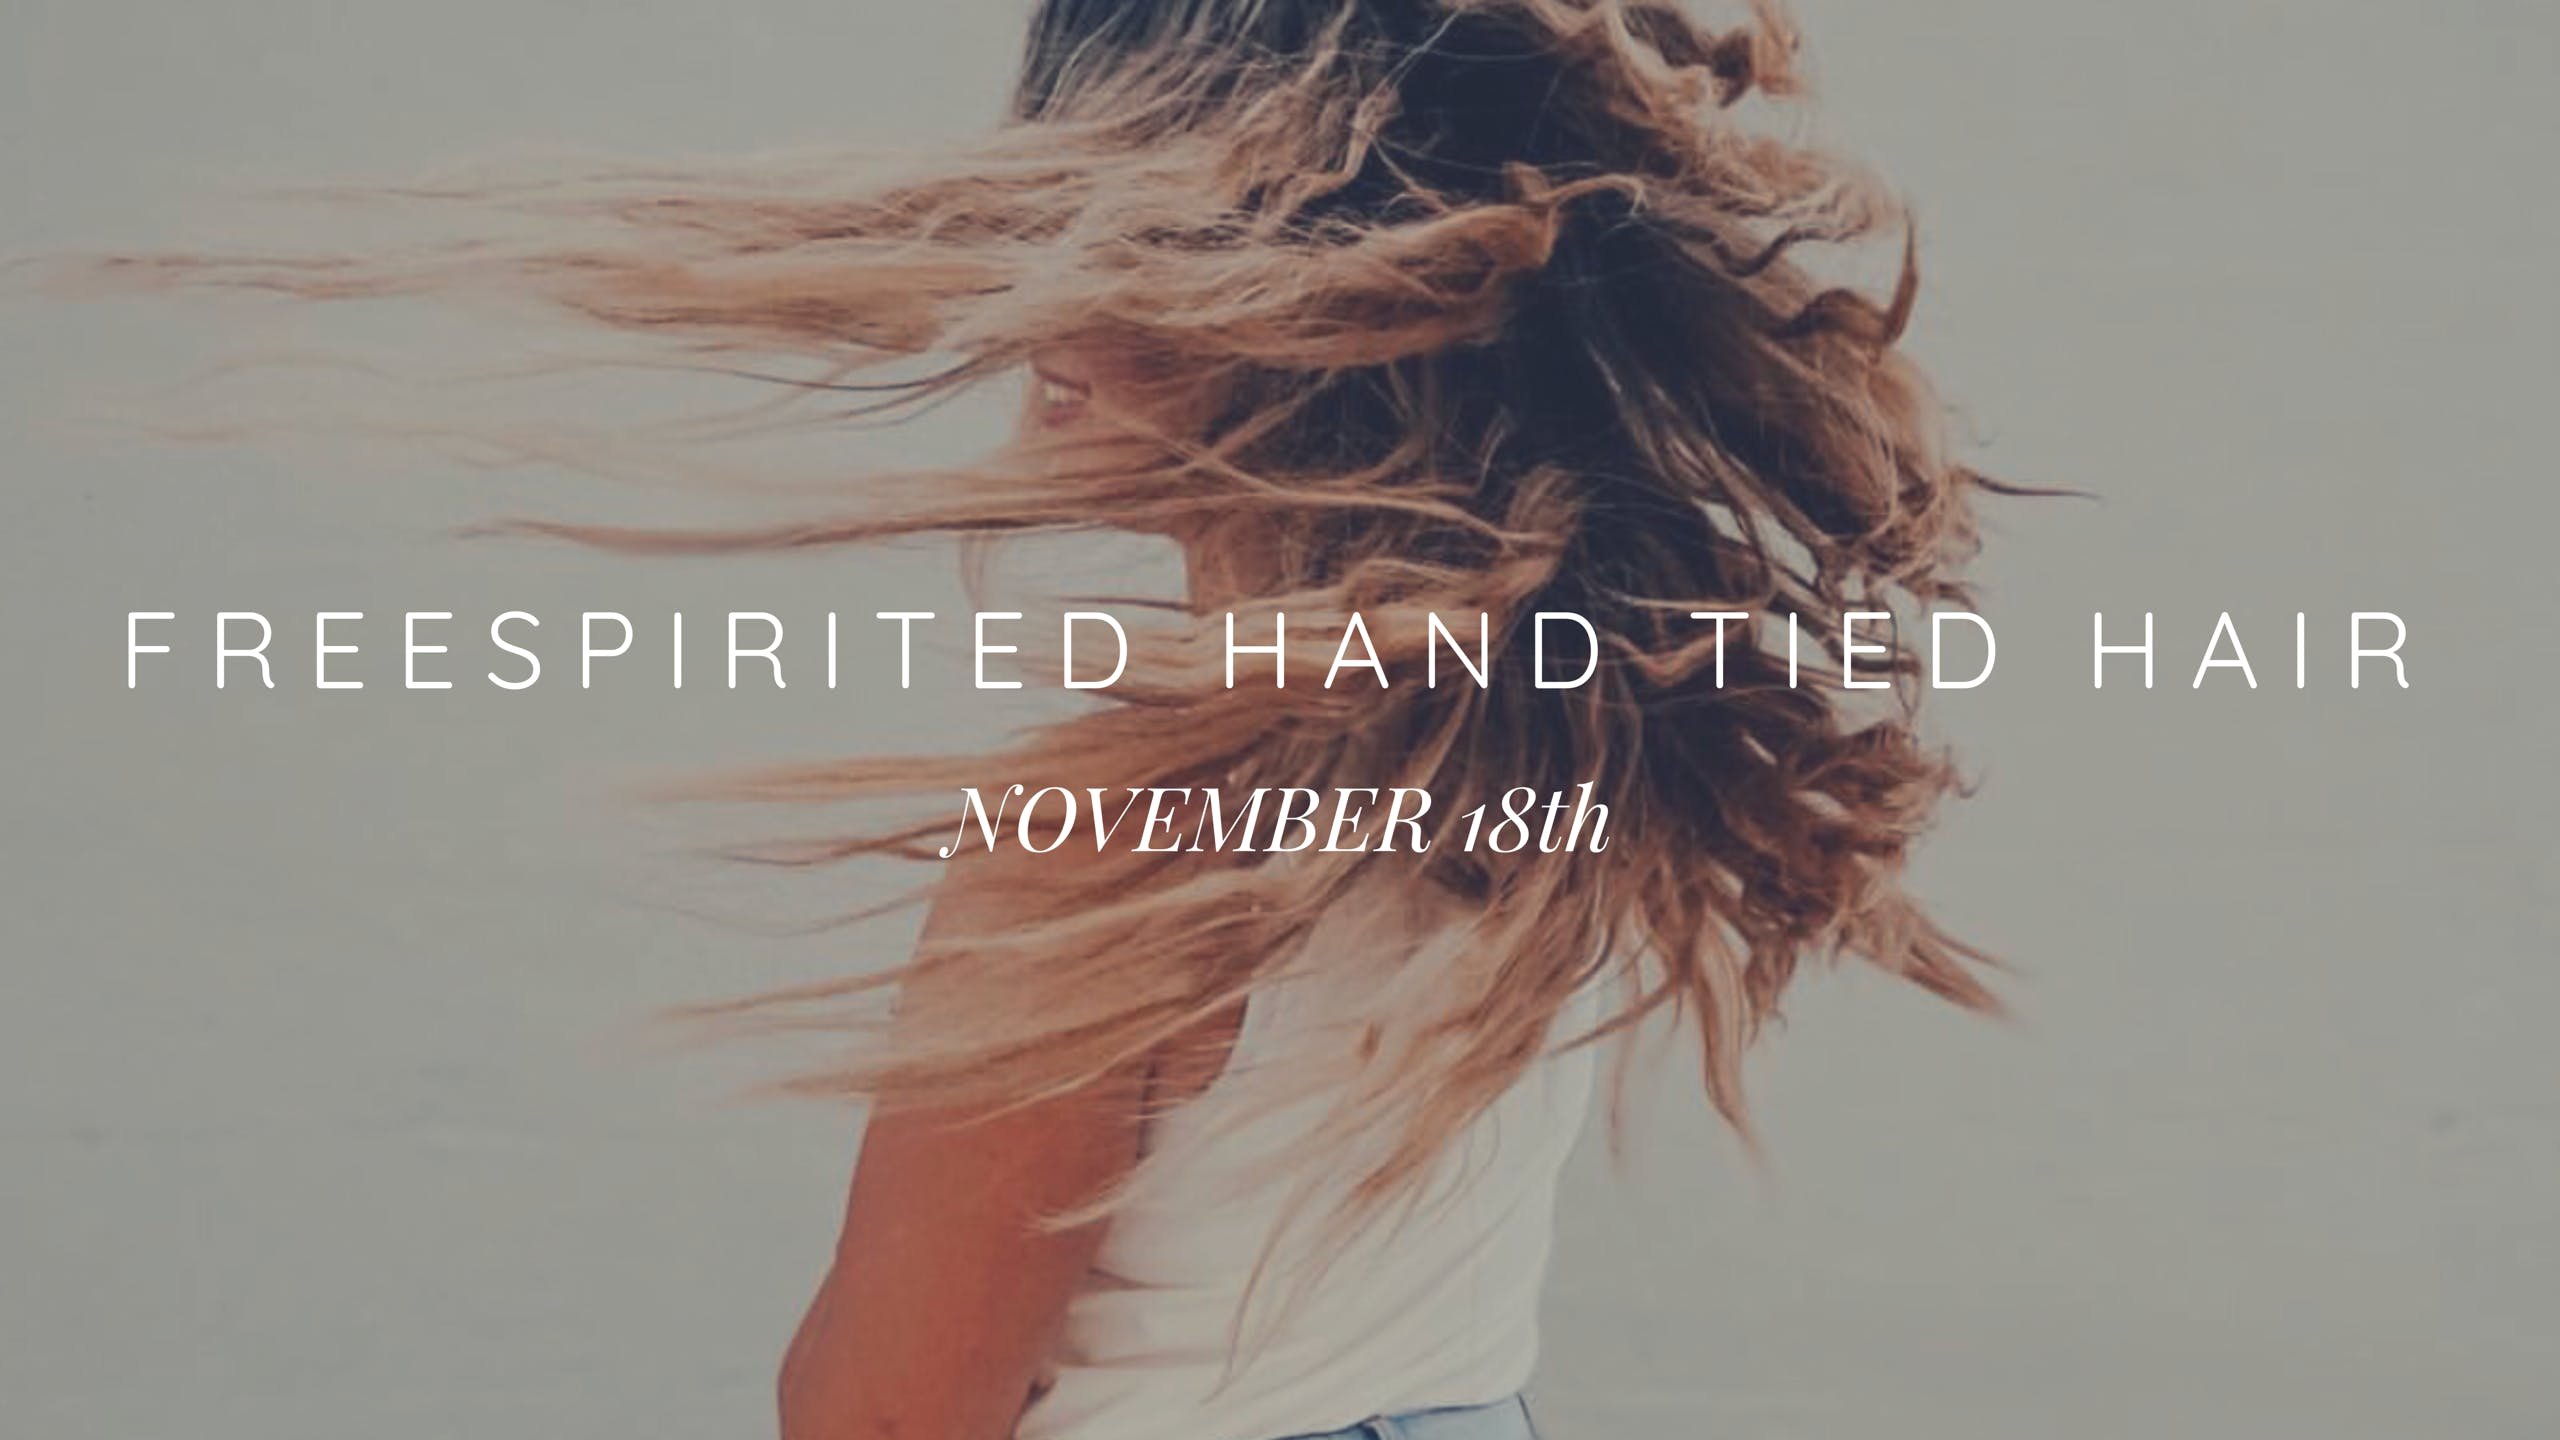 Freespirited Hand Tied Hair Extension Class 18 Nov 2018